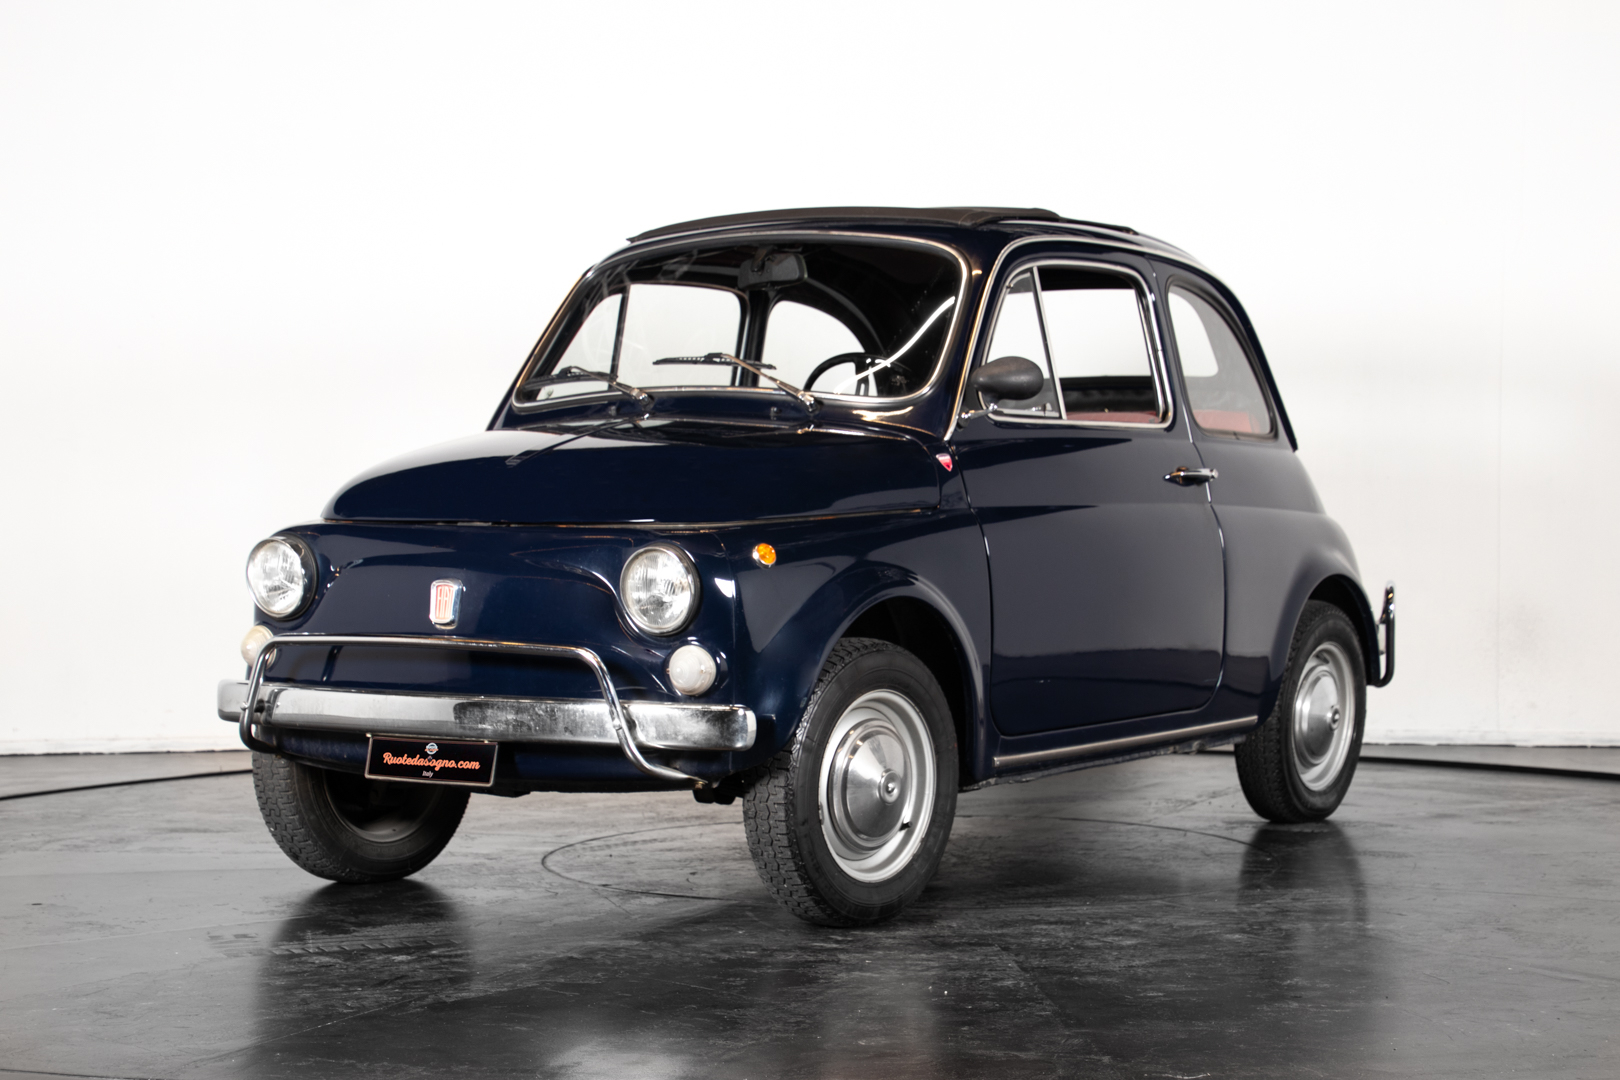 1972 fiat 500 l fiat oldtimer automobilen ruote da. Black Bedroom Furniture Sets. Home Design Ideas